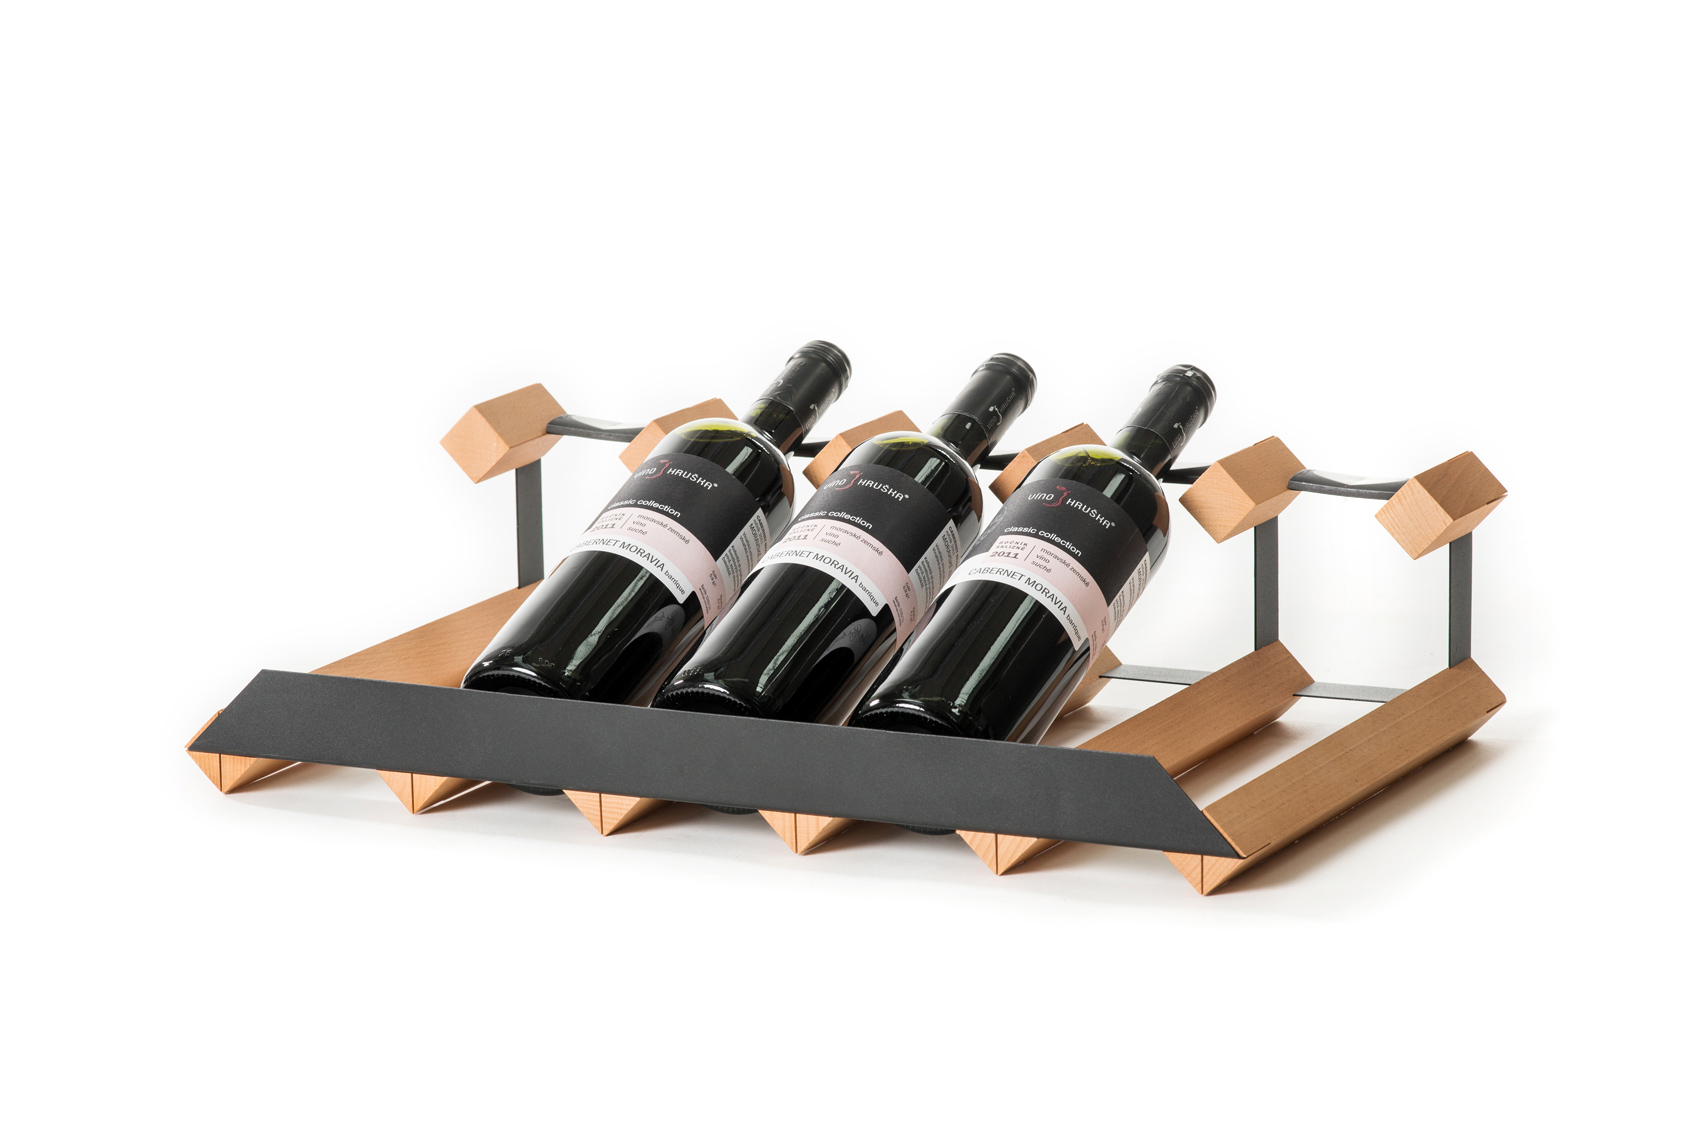 Stojan na víno pultový na 5 lahví